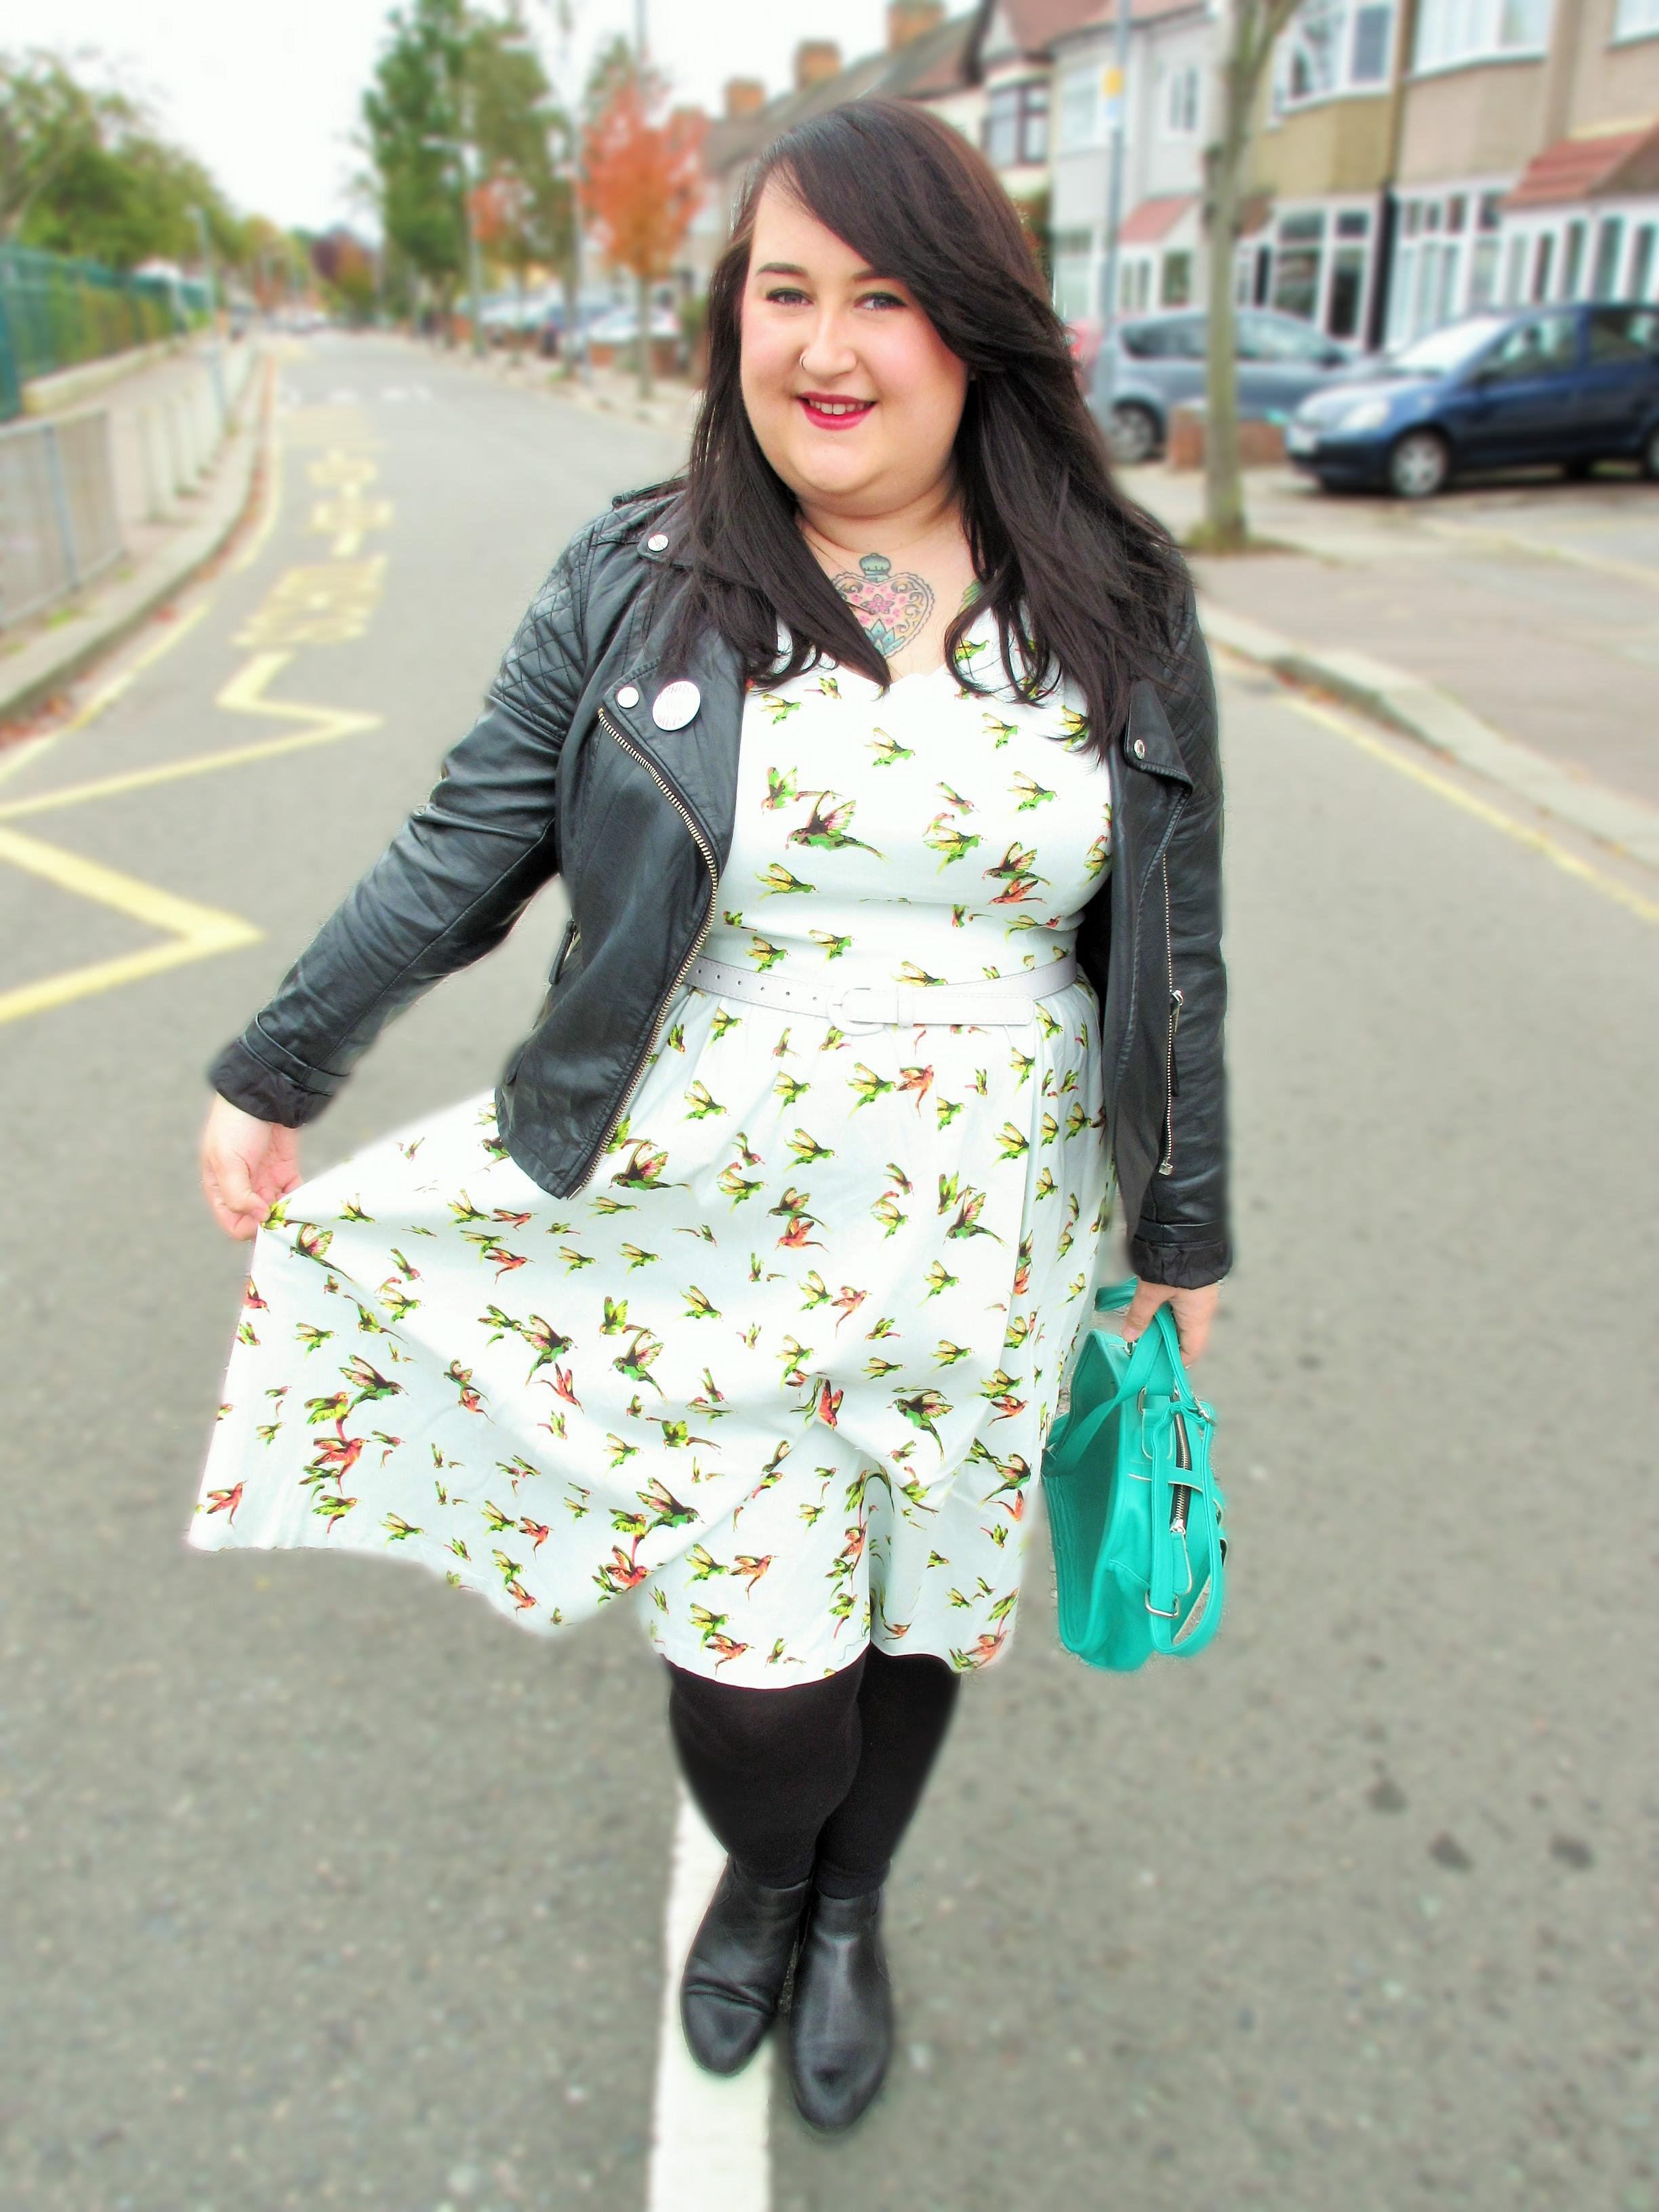 http://www.lindybop.co.uk/dresses-c1/reena-hummingbird-print-swing-dress-p1954